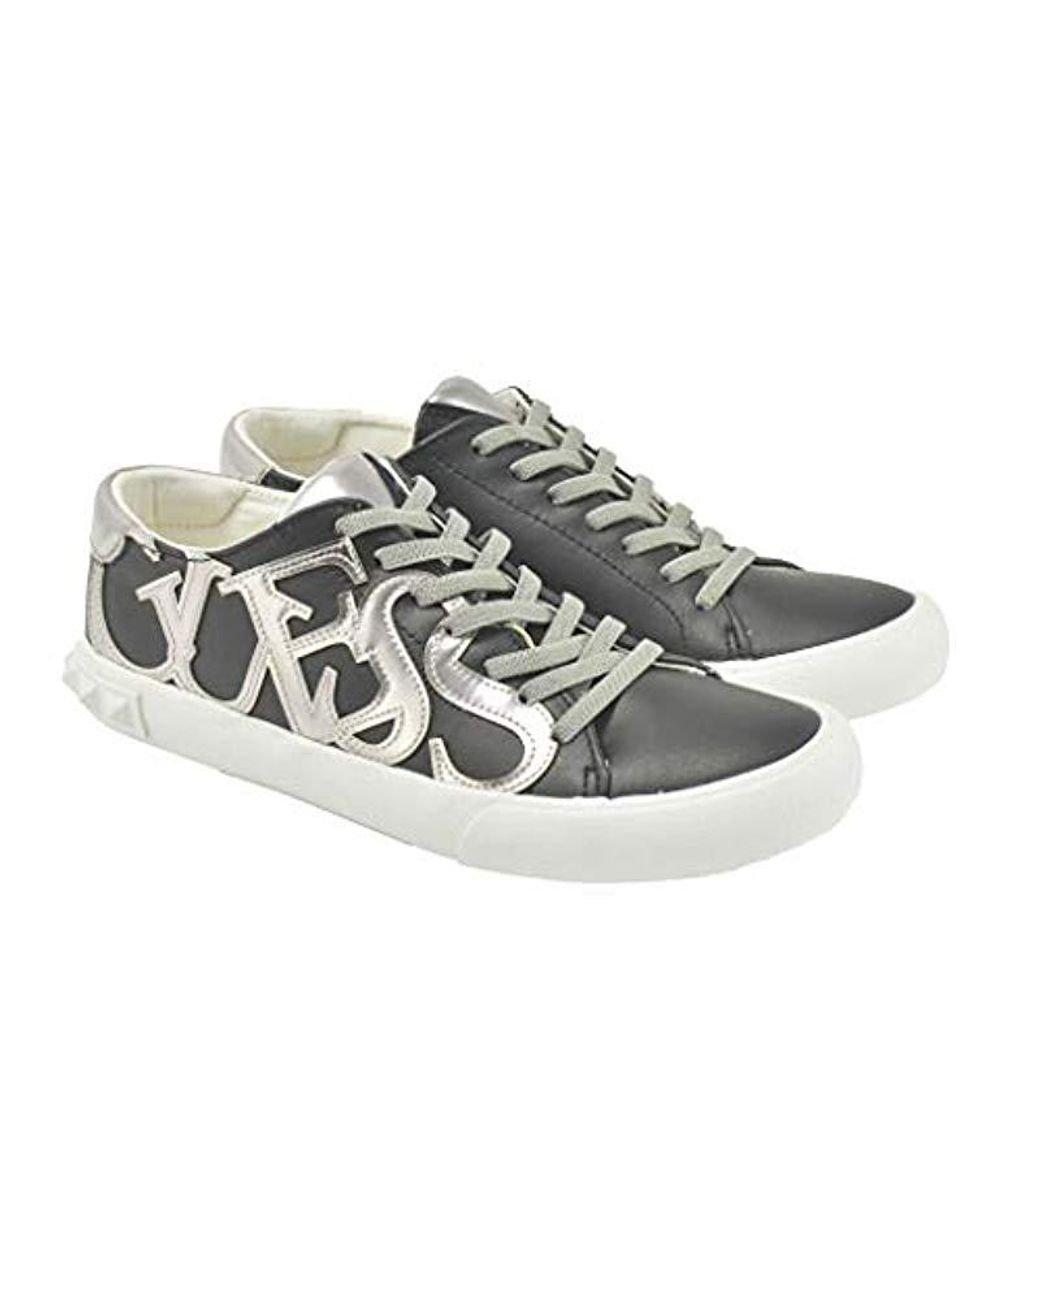 Guess Noir Femme 37 Fl5hamele12 Sneakers GVSzUMqp